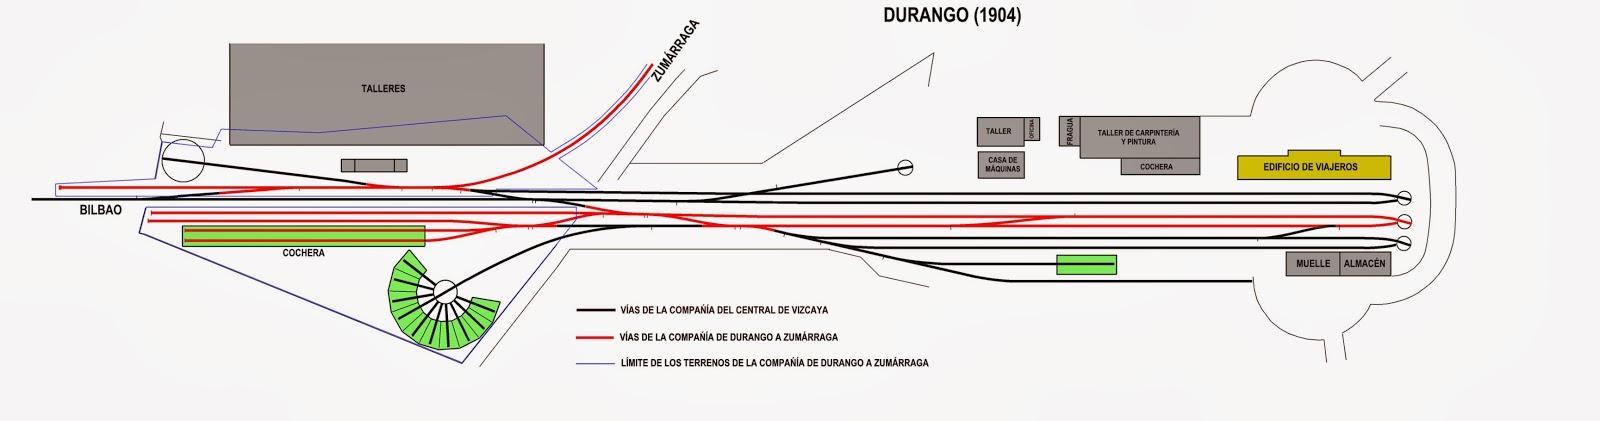 Instalaciones de Durango , dibujo Pedro Pintado Quintana